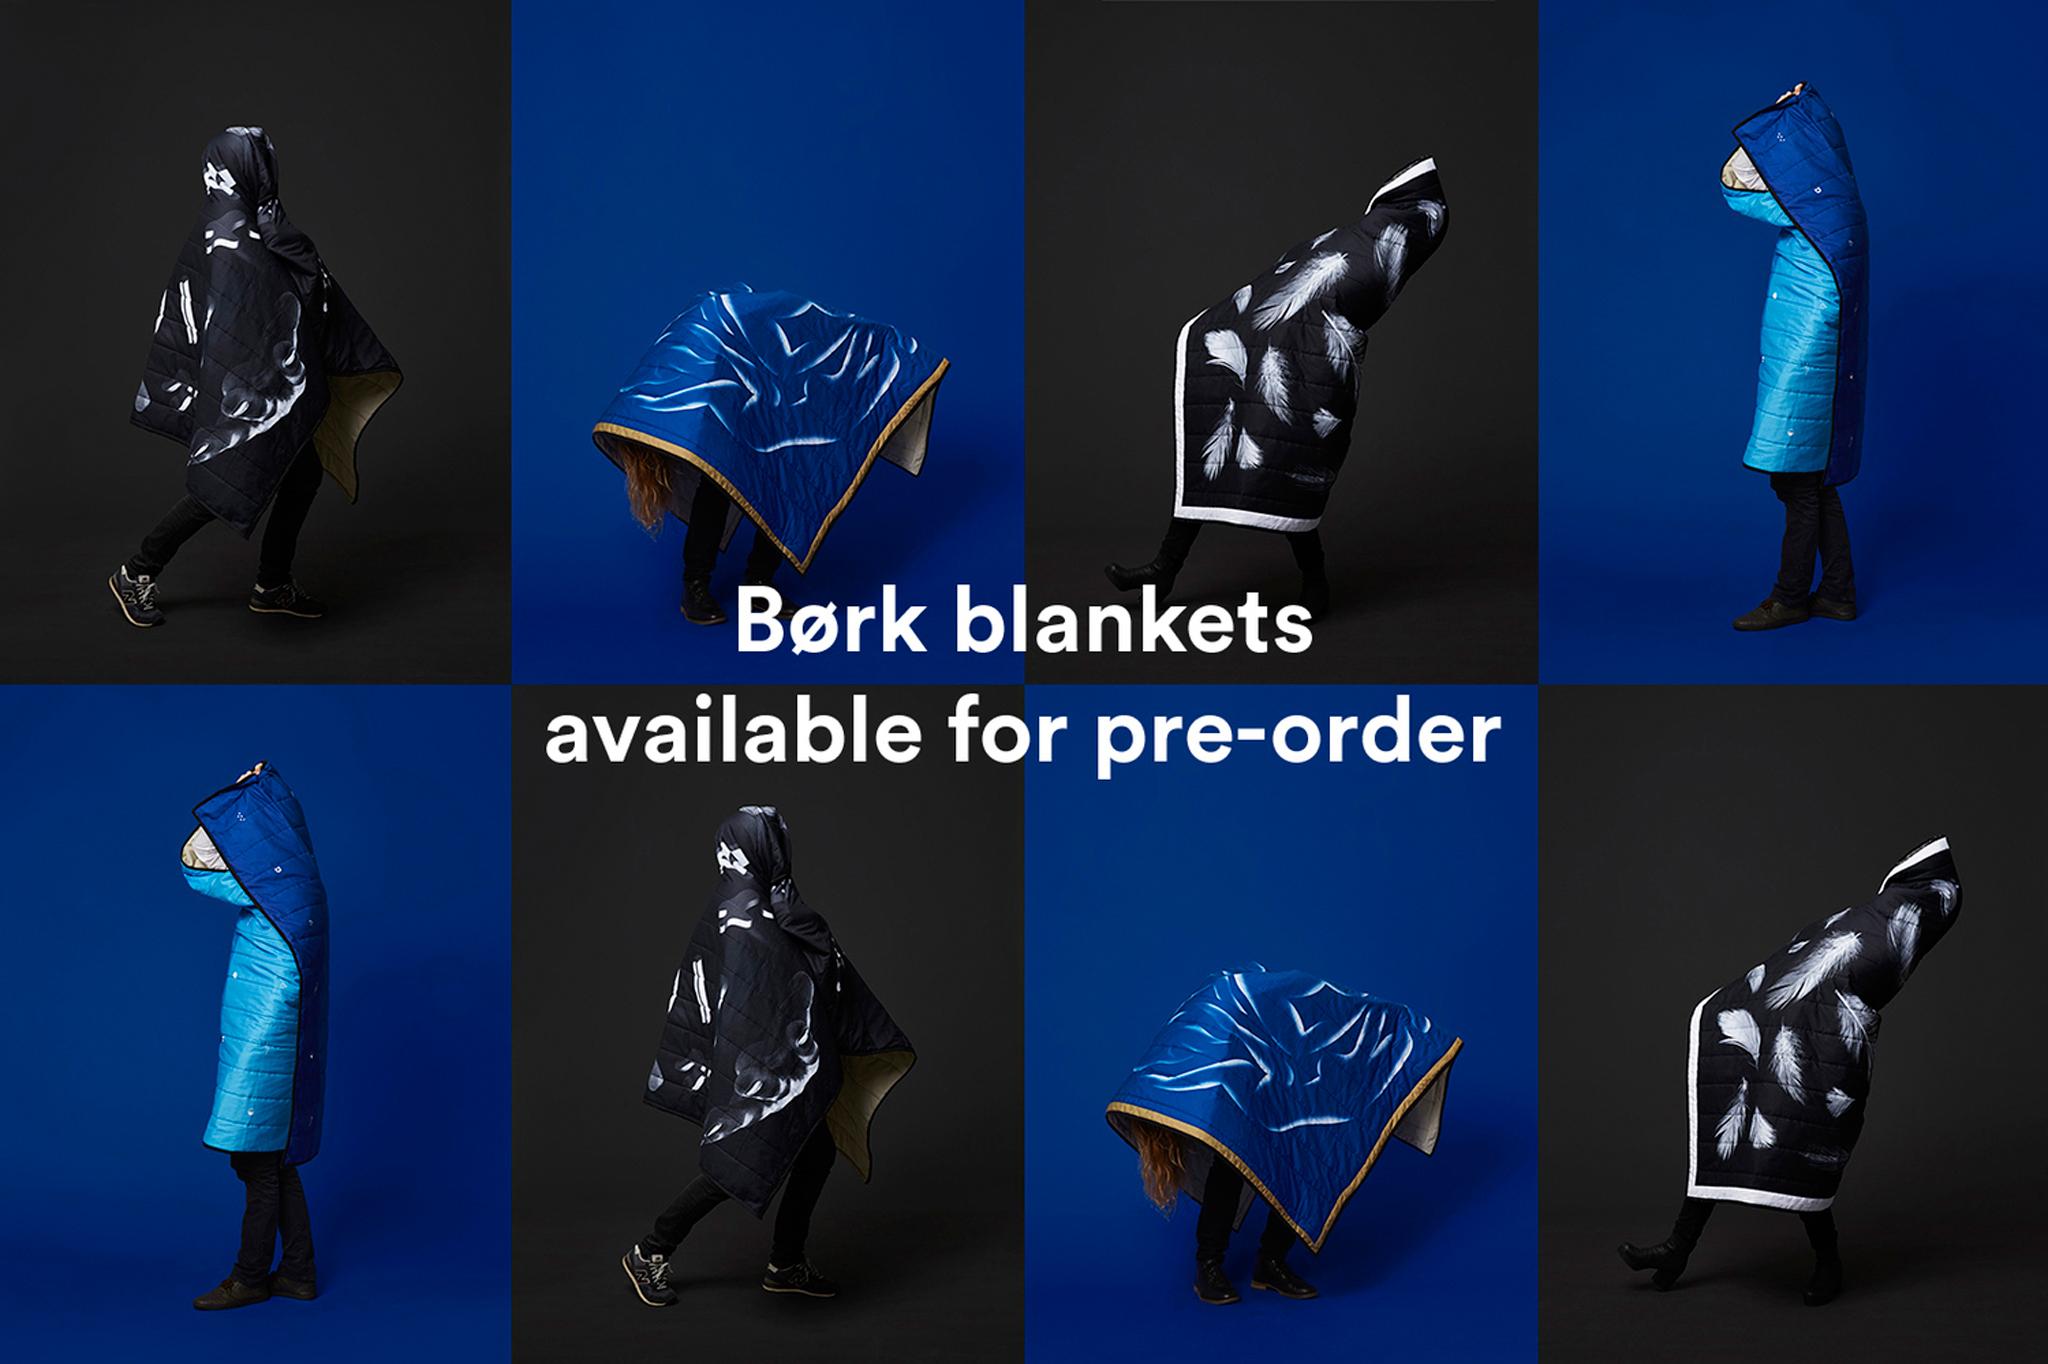 Bork-header3.jpg